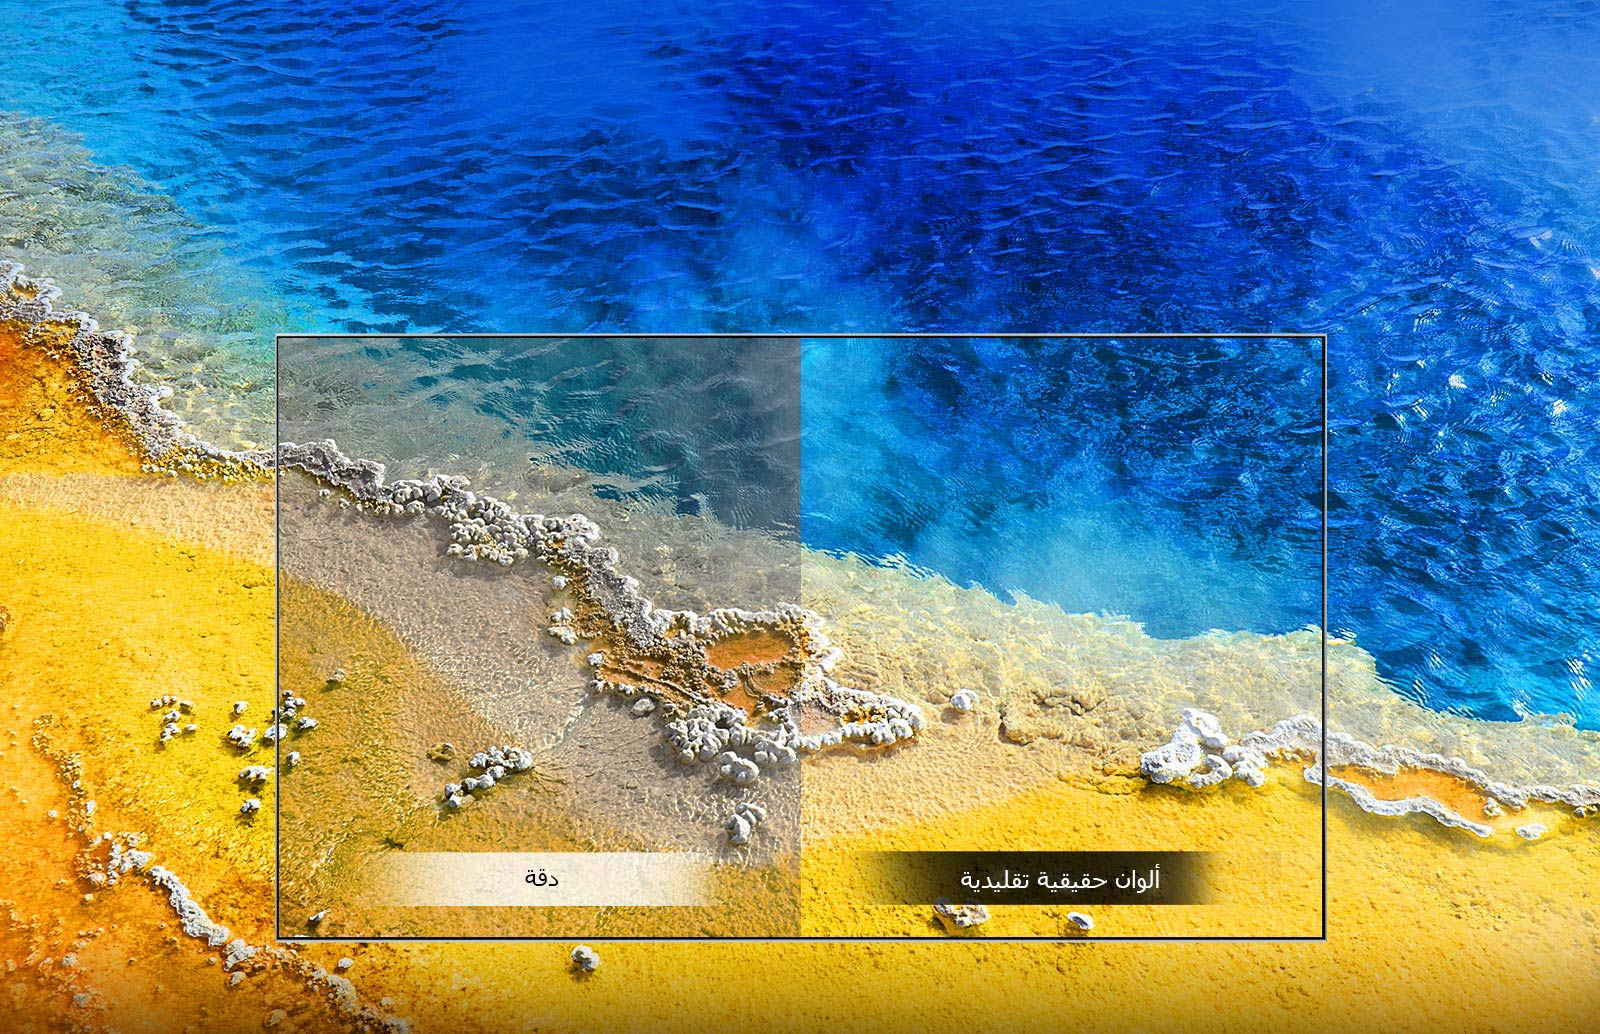 TV-UHD-49-UM73-05-True-Color-Accuracy-Desktop